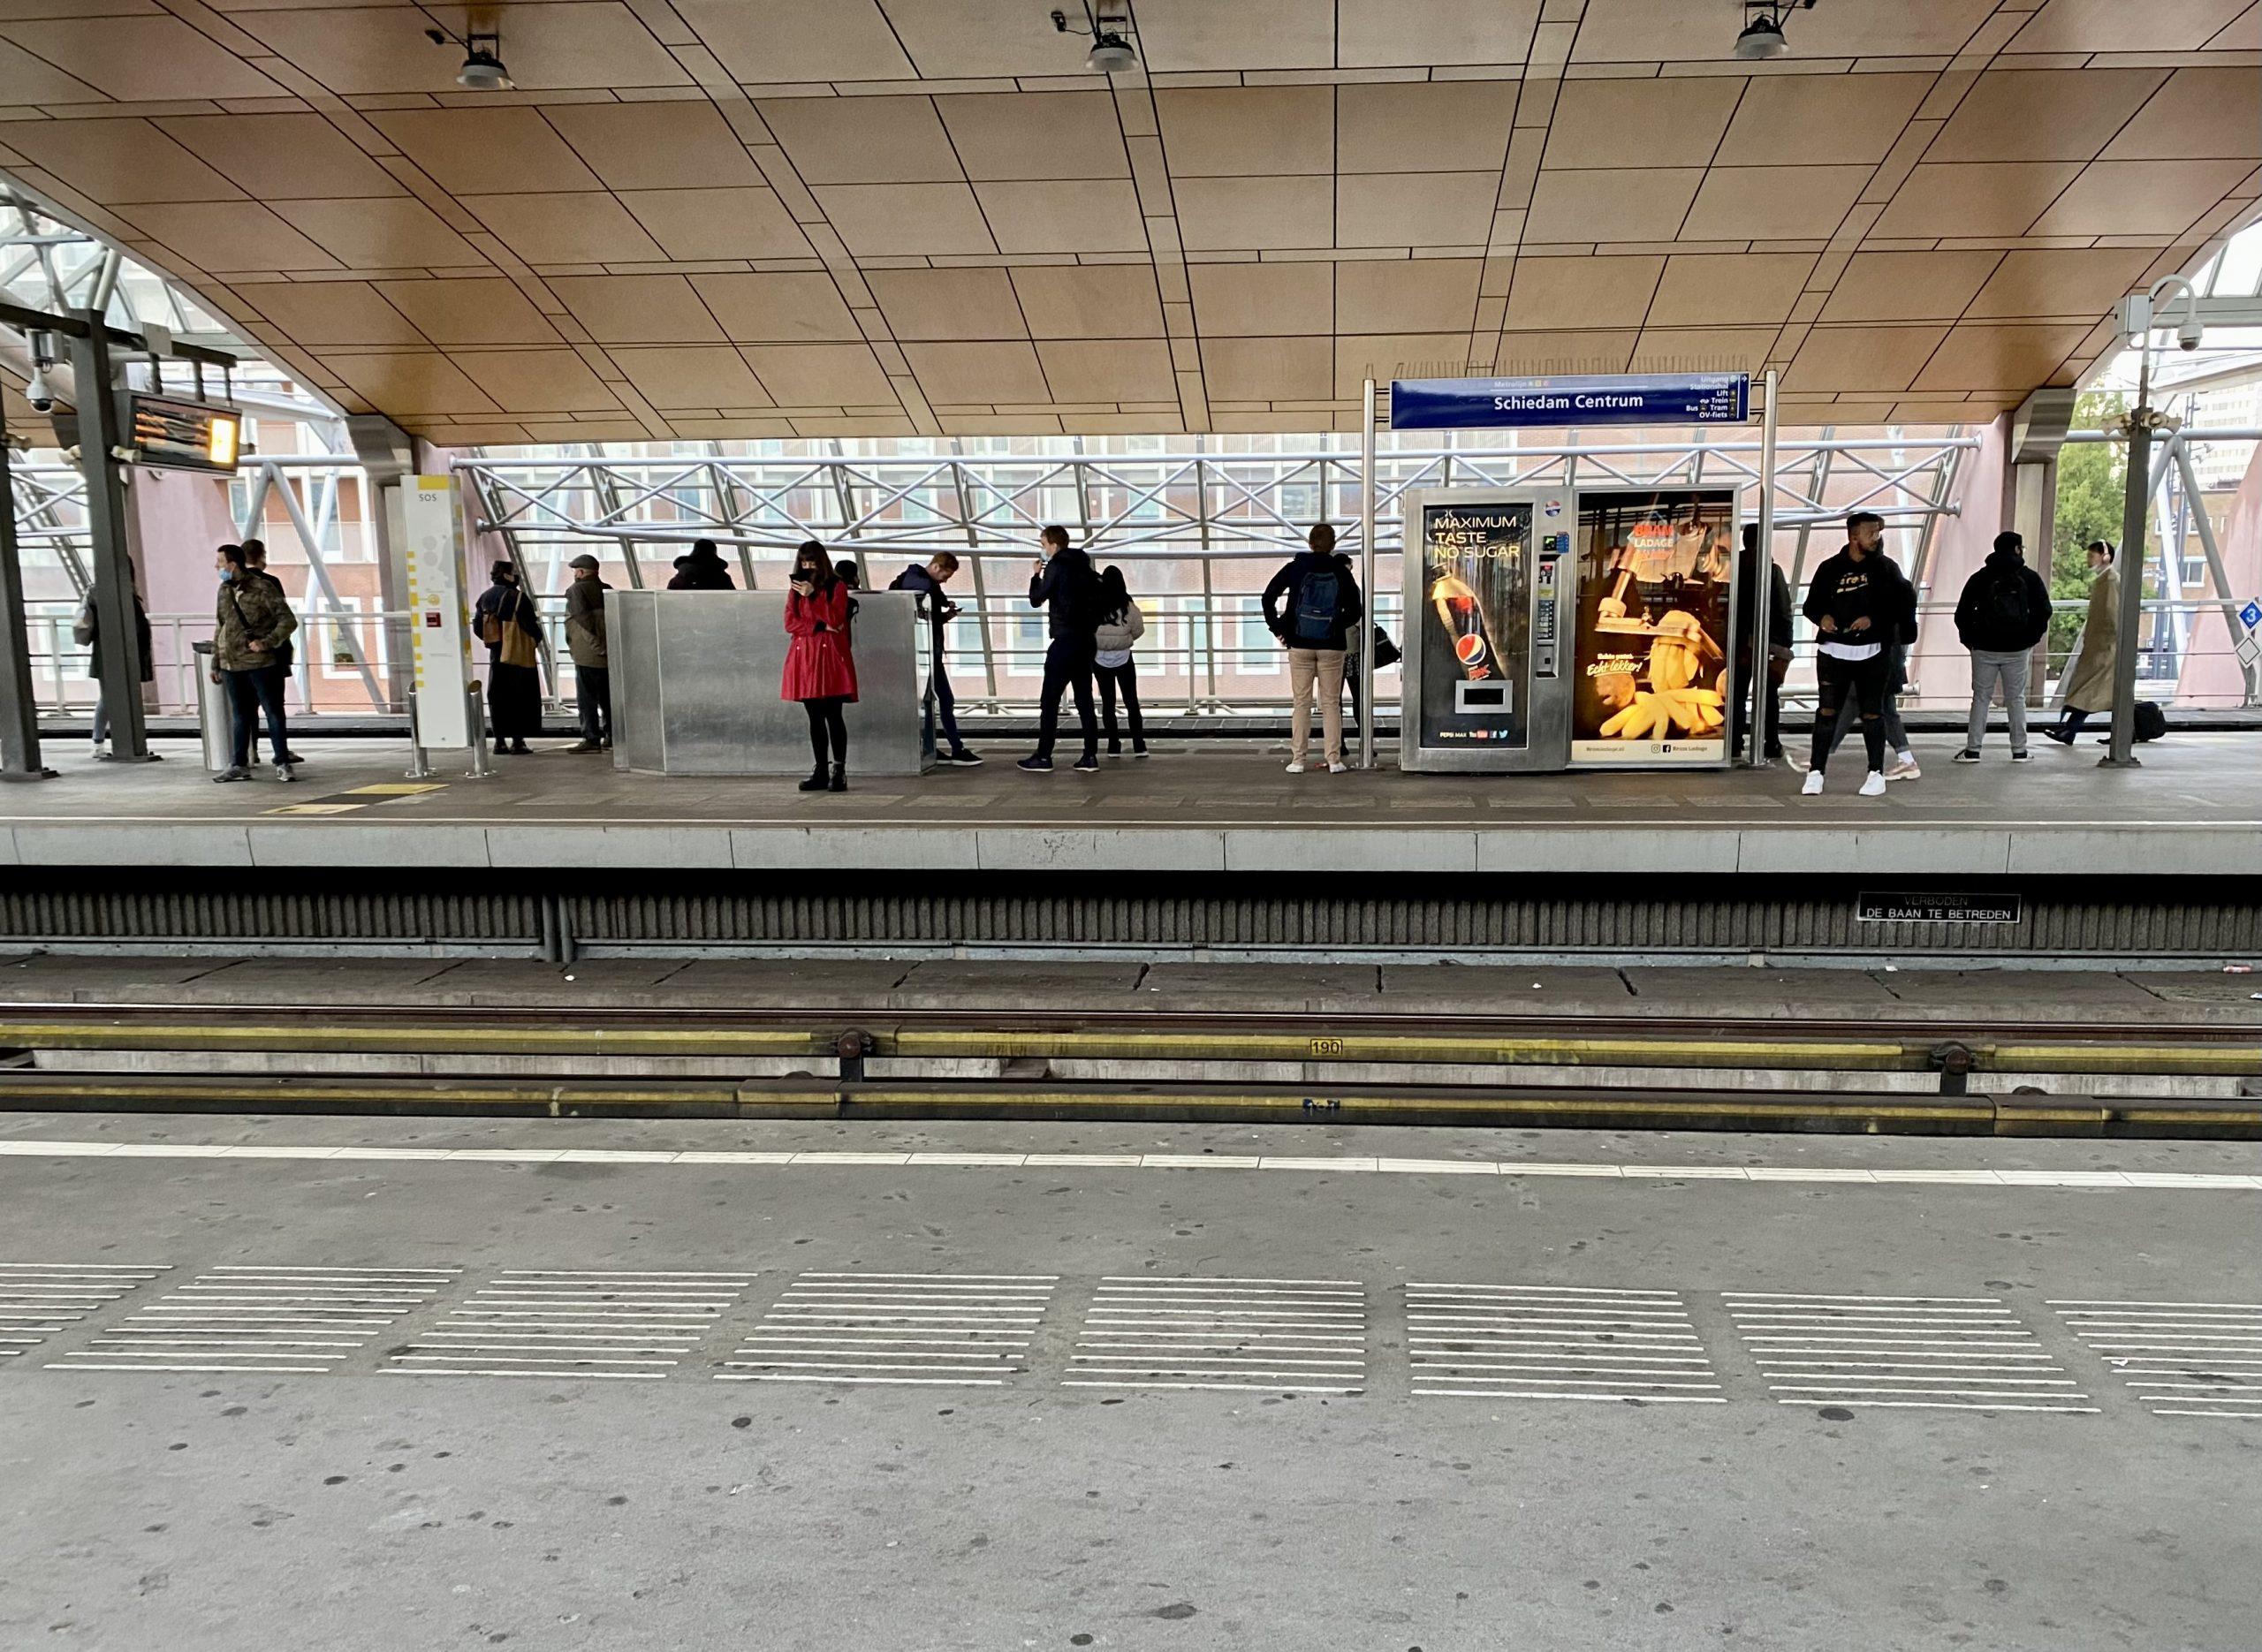 Reizigers Schiedam Centrum